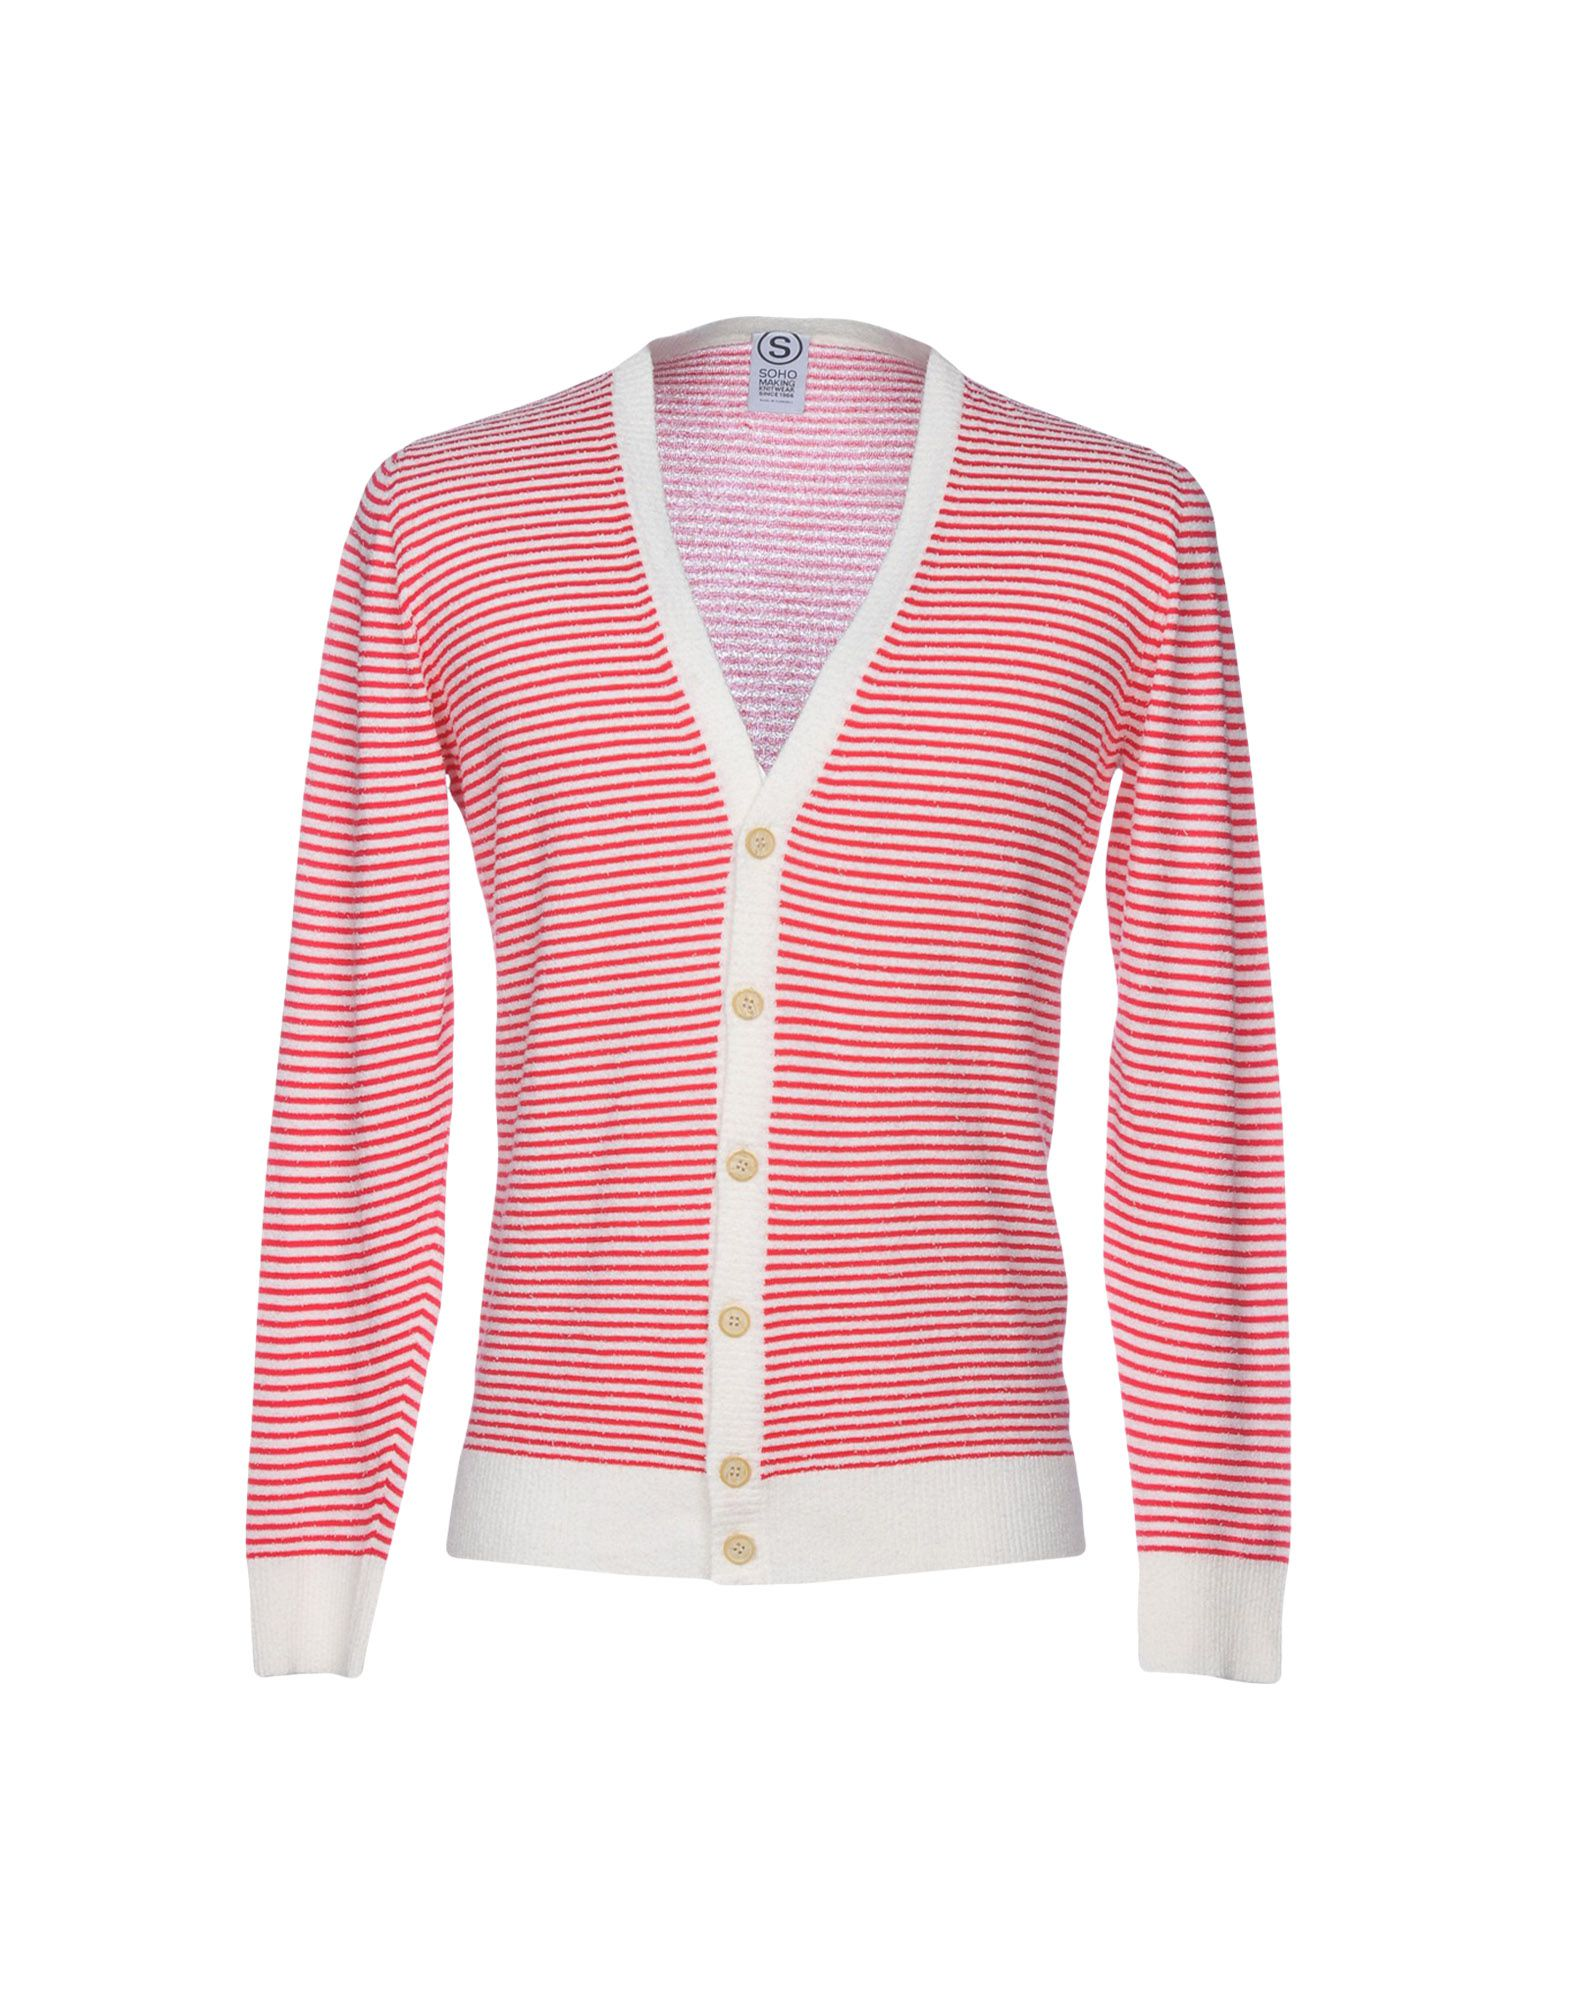 SOHO Cardigan in Pink